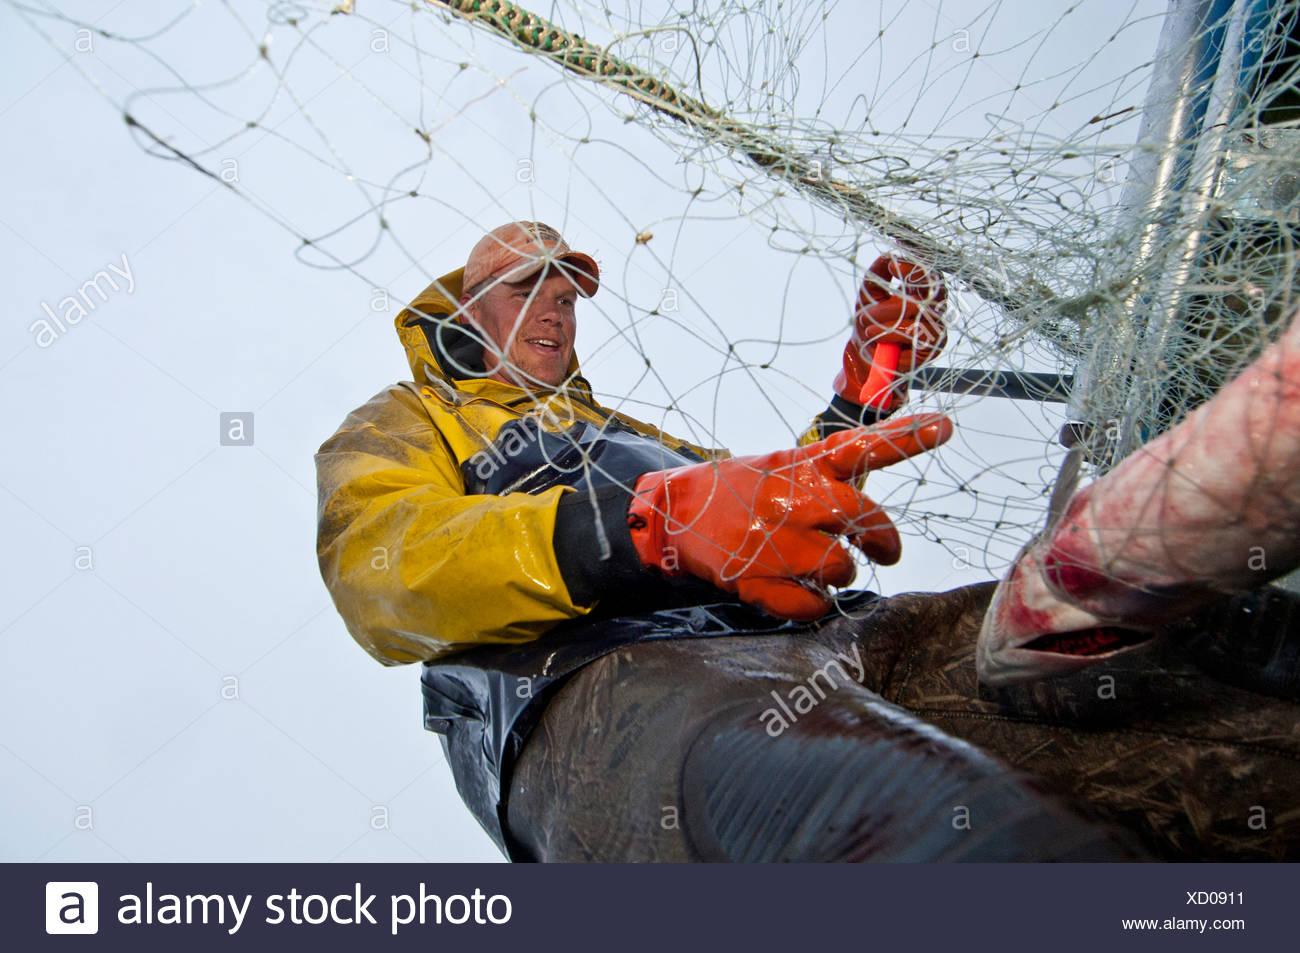 Commercial fisherman picks sockeye salmon off a gillnet at a set net site in the Naknek River, Bristol Bay, Alaska, Summer - Stock Image